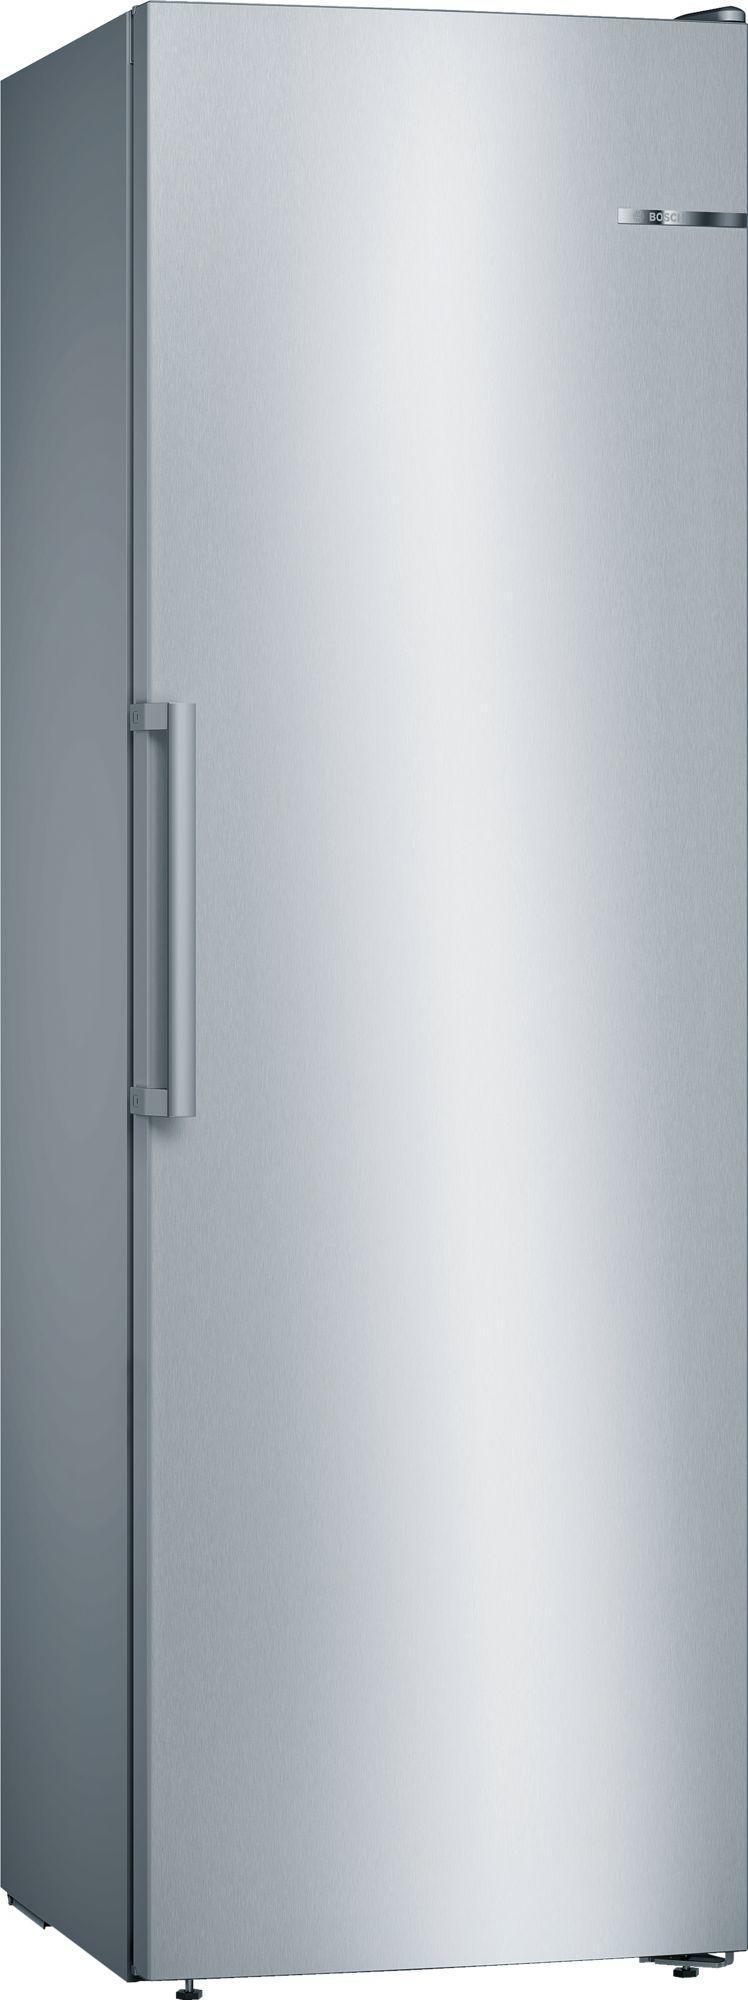 Image of Serie 4 GSN36VLFP 60cm 242 Litre Frost Free Tall Single Door Freezer | Silver Innox